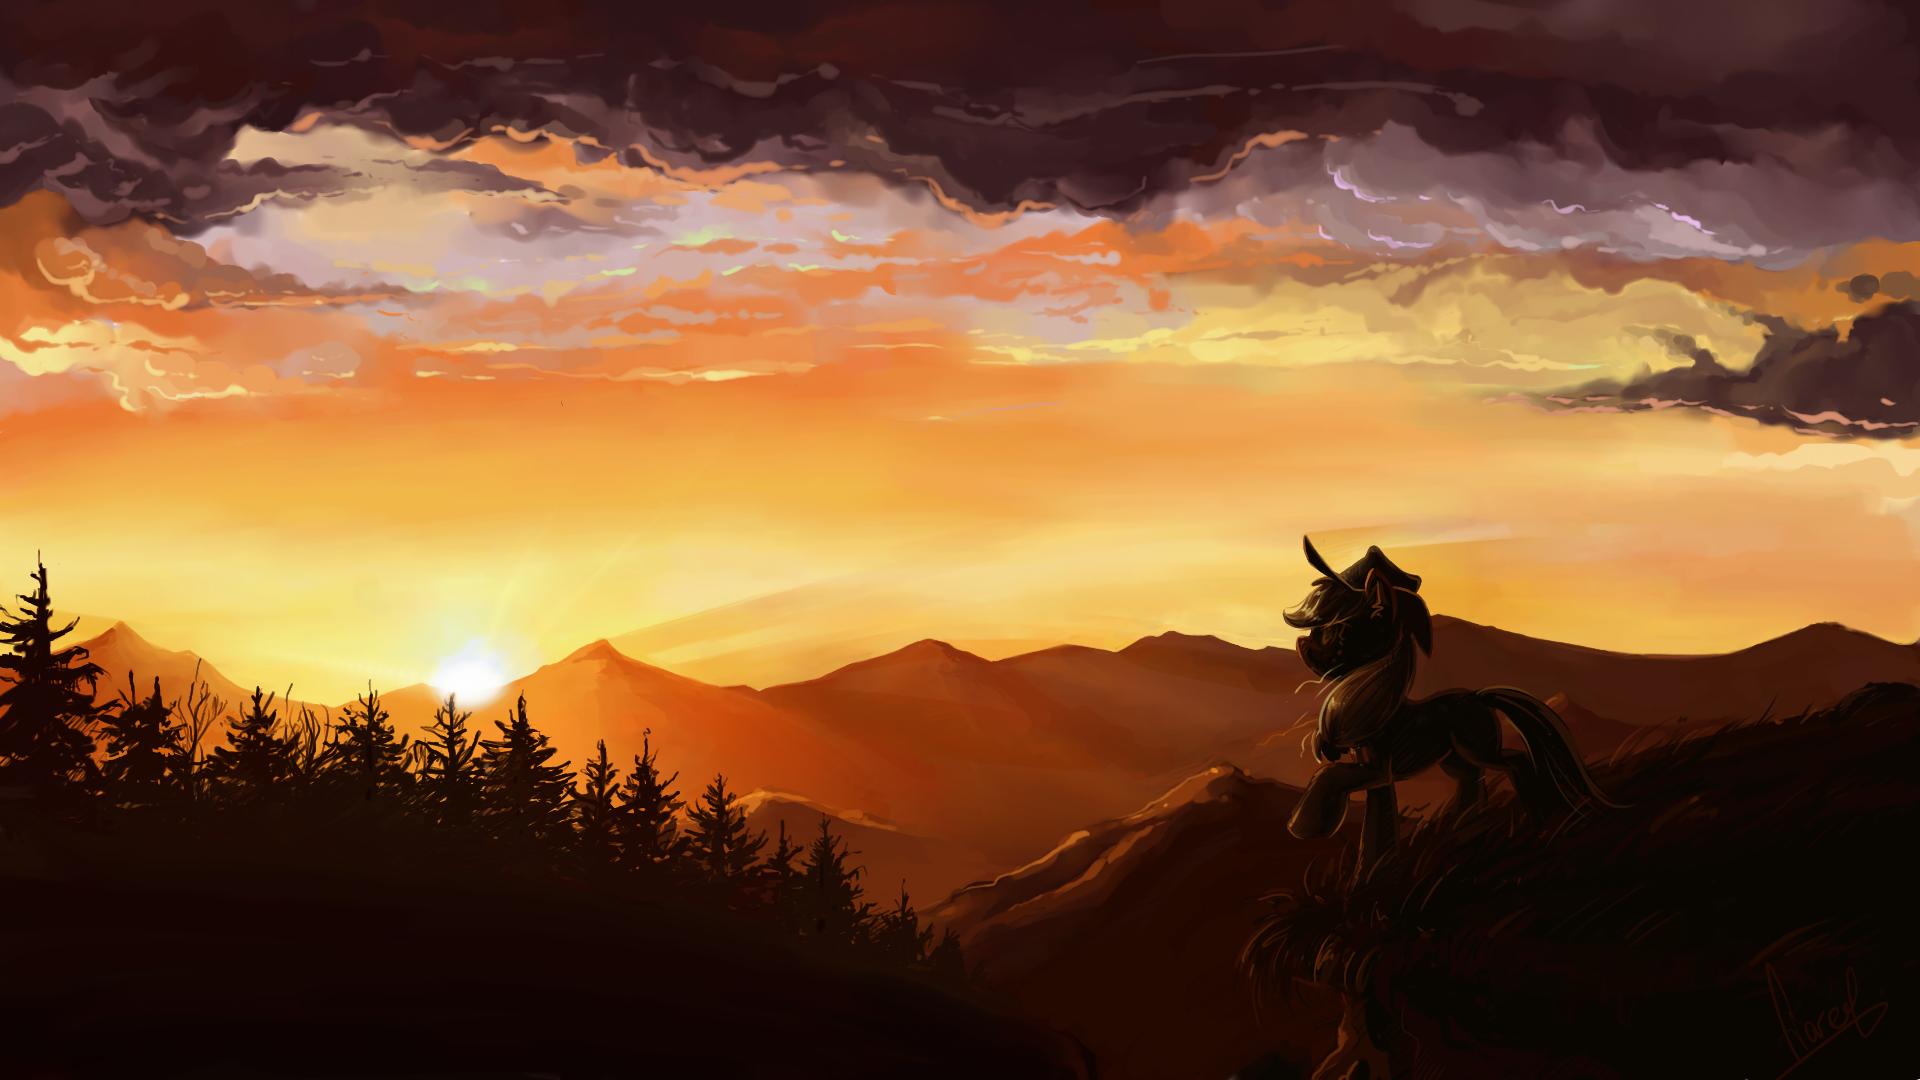 My Little Pony Friendship Is Magic Hd Wallpaper - My Little Pony Wallpaper 3d Hd - HD Wallpaper